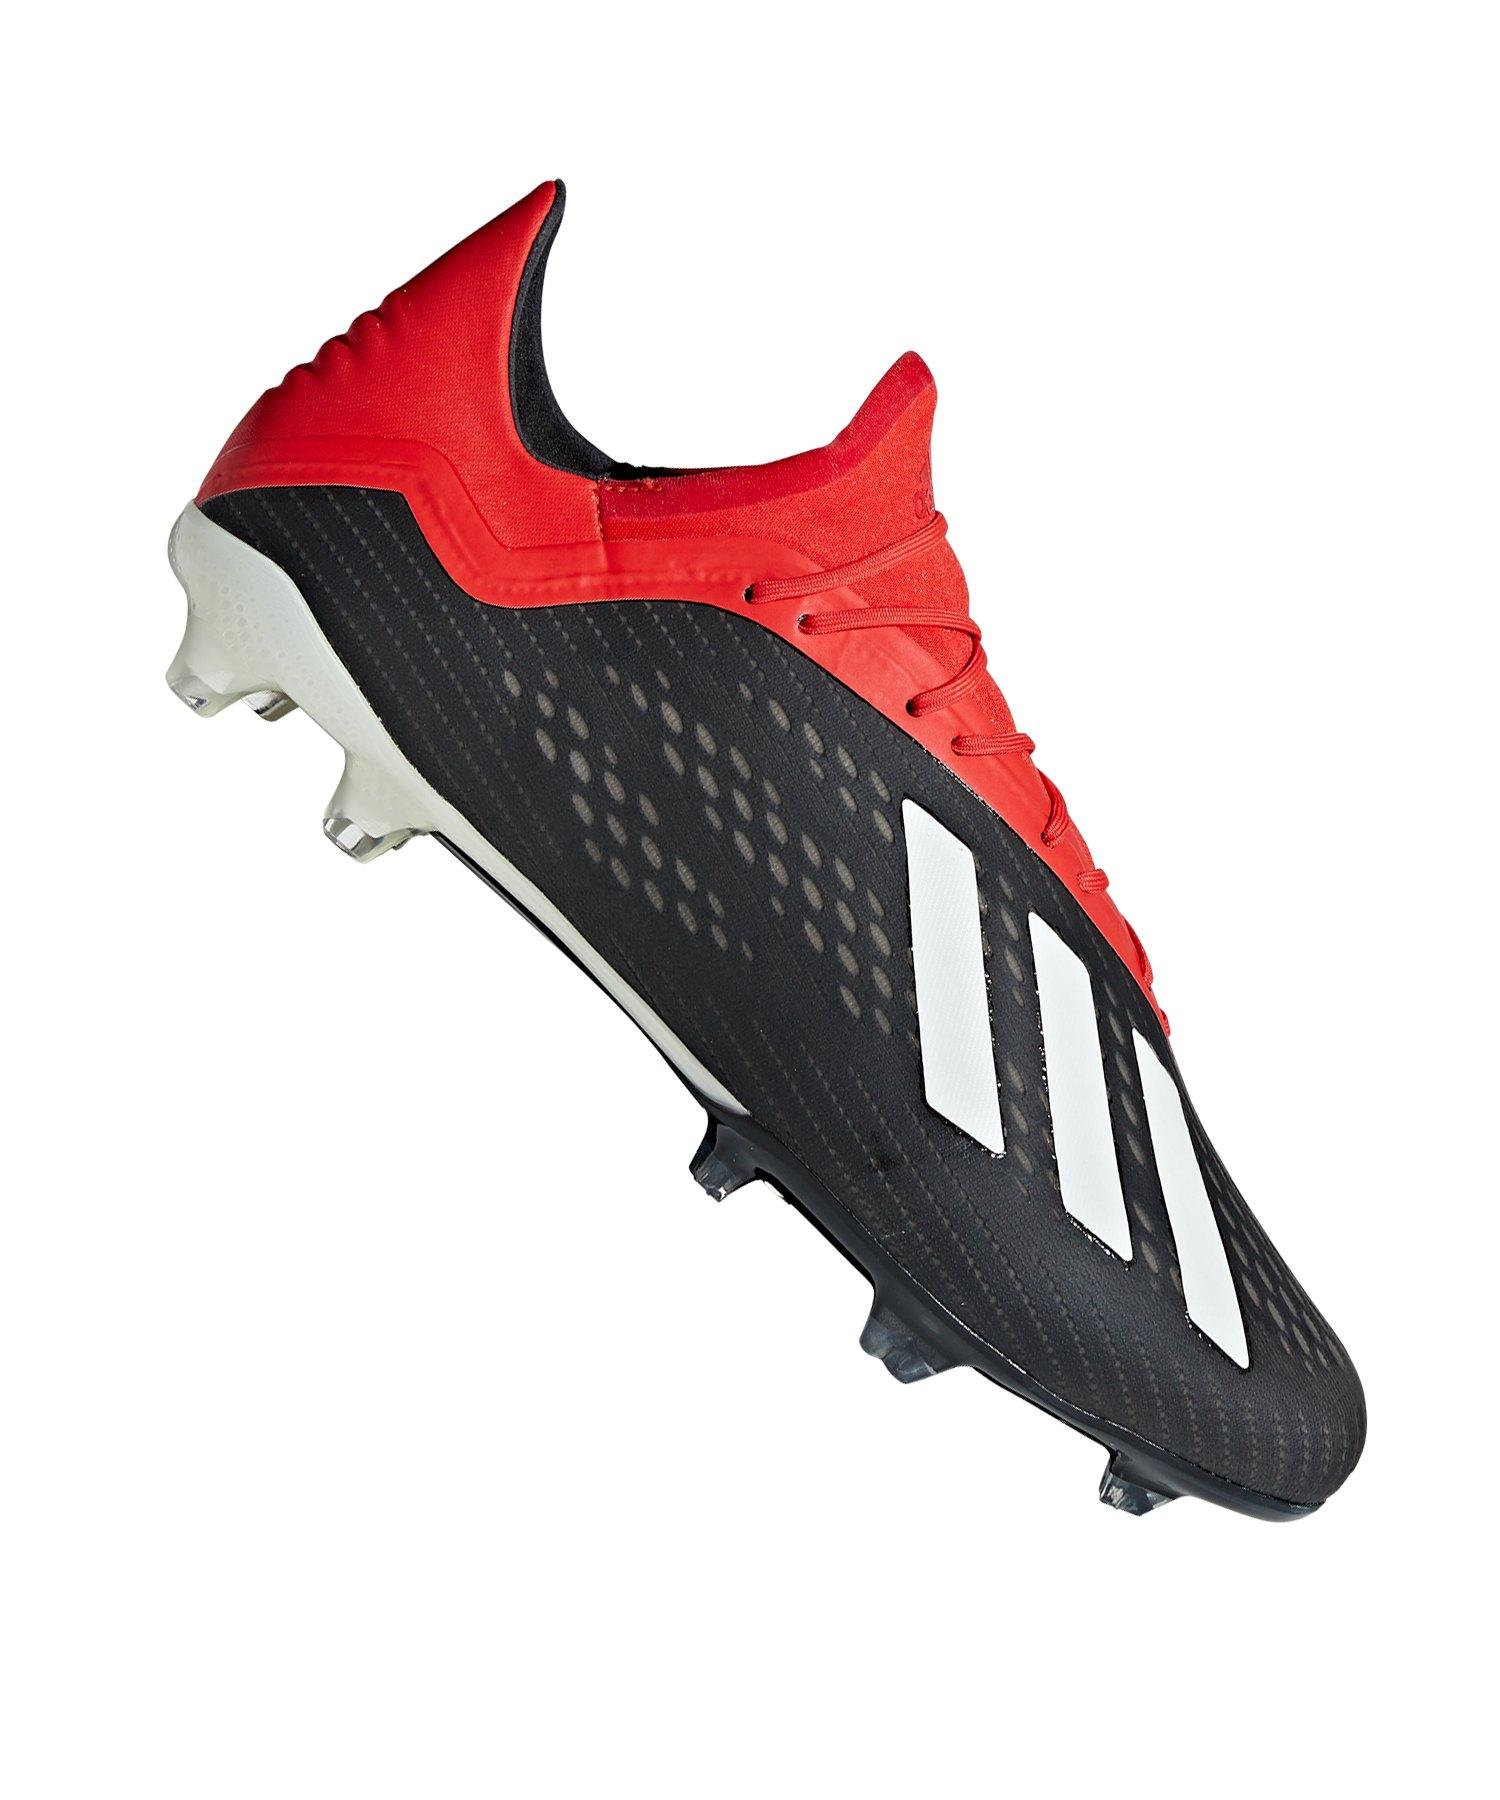 sports shoes 70f9a 6f650 adidas X 18.2 FG Schwarz Rot - schwarz